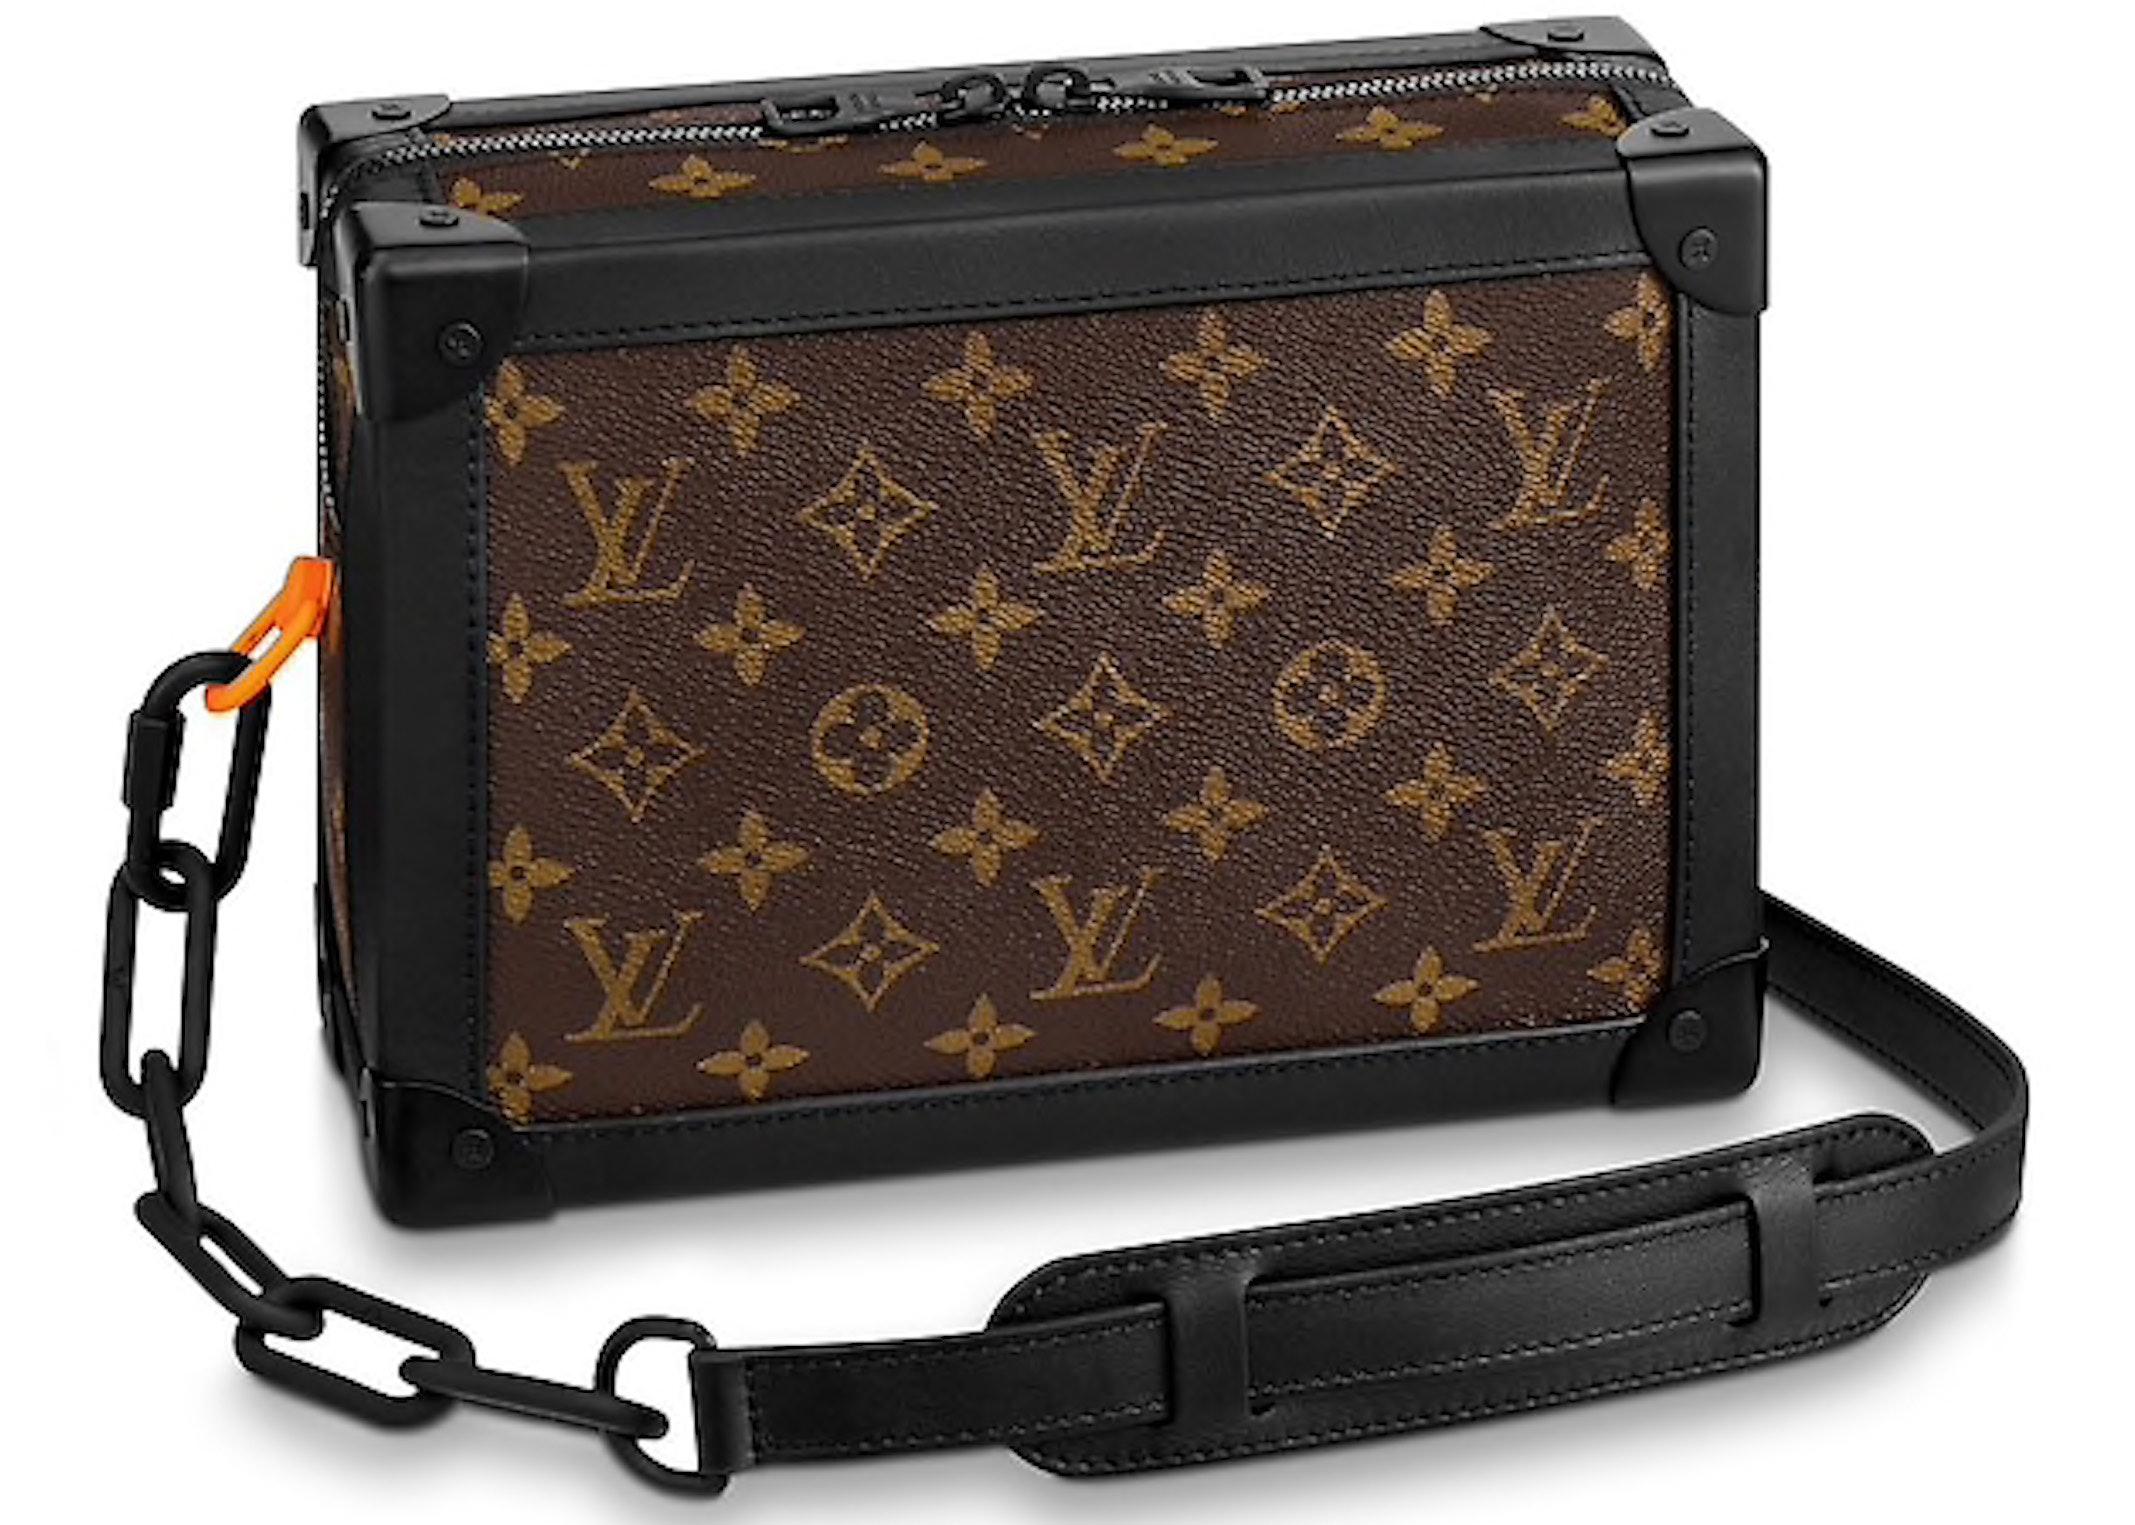 Louis Vuitton Soft Trunk Monogram Brown